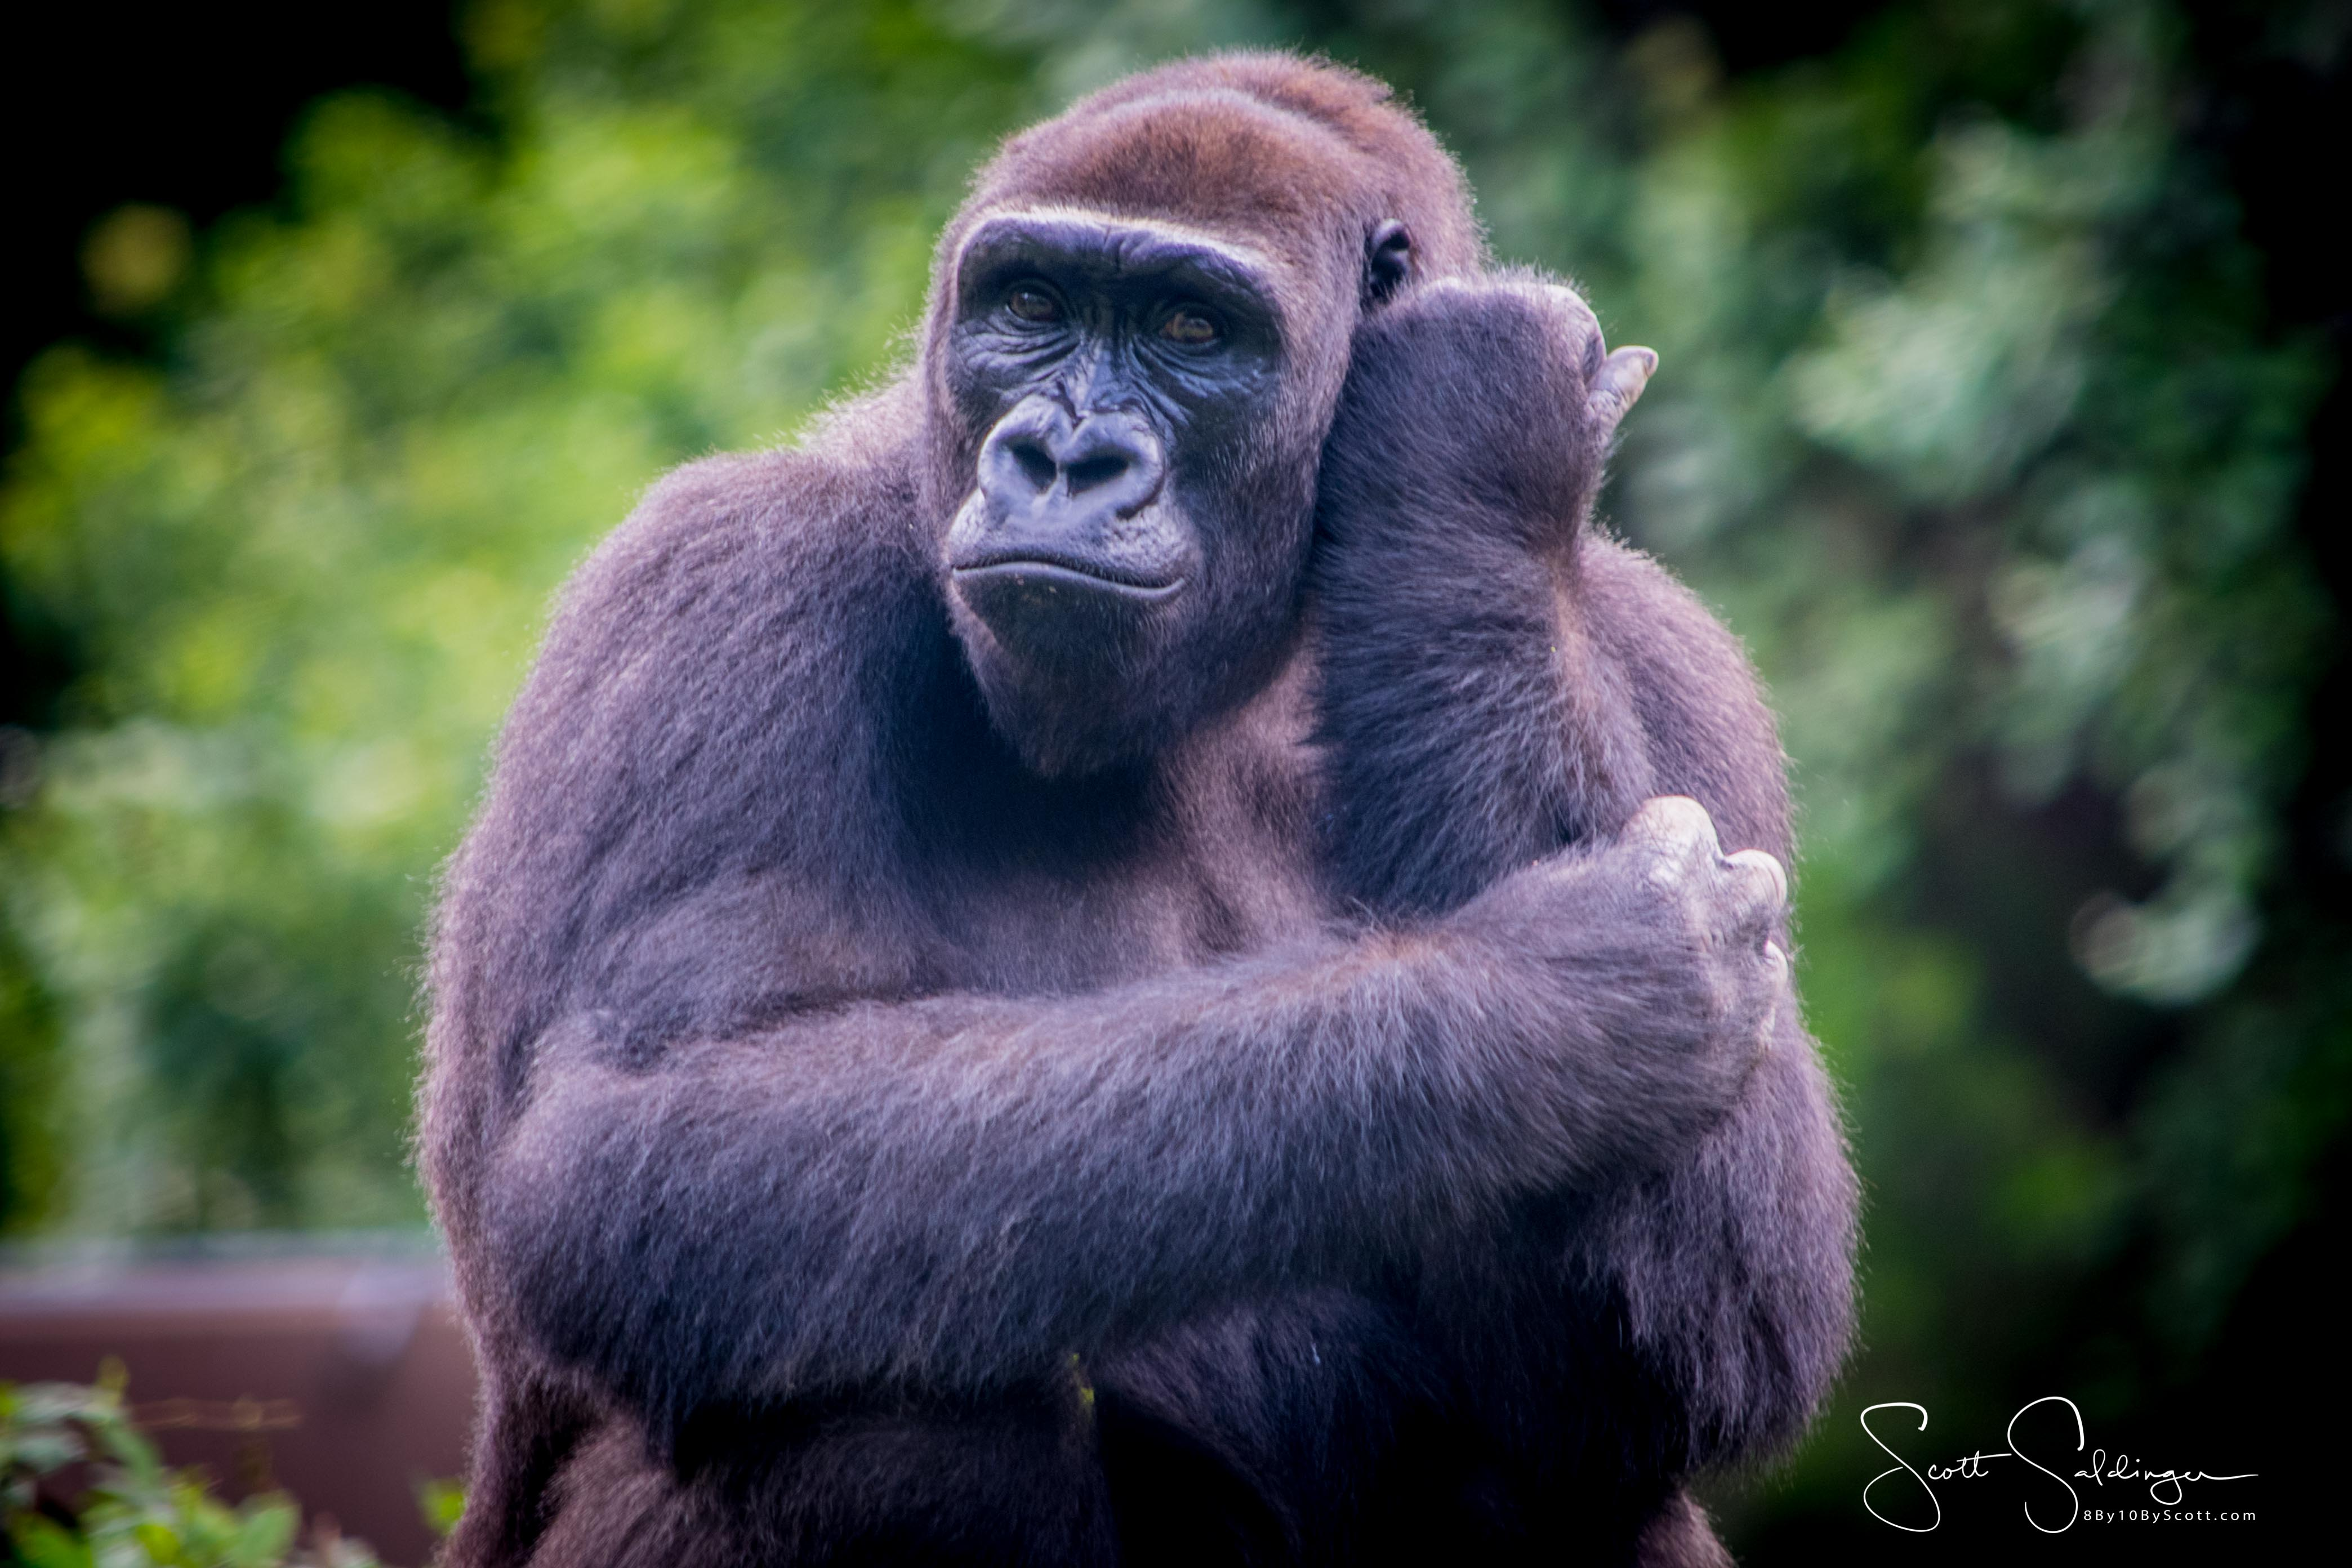 Apes-5418